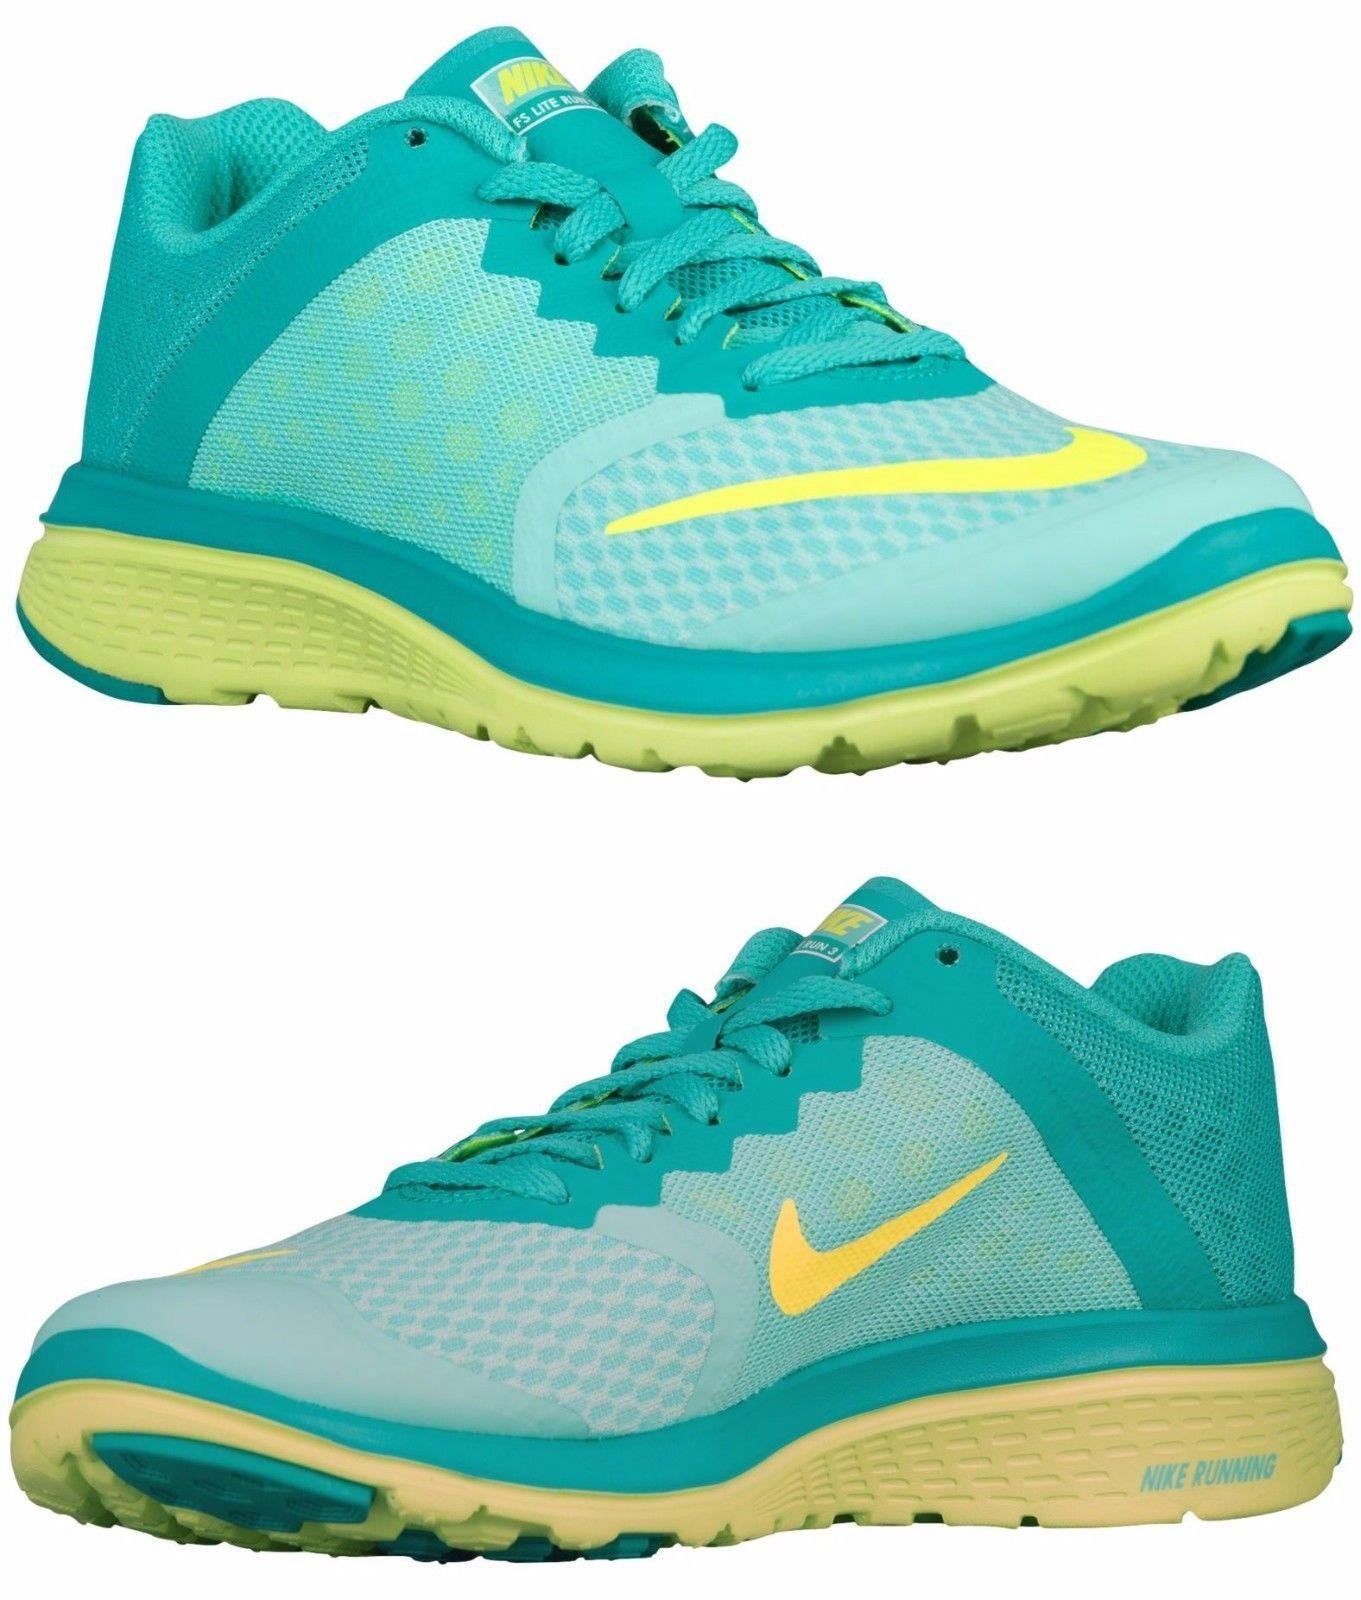 1242eda72a4c Nike Fs Lite Run 3 Women S Mesh M Running Hyper Turquoise - Volt - White -  Jade